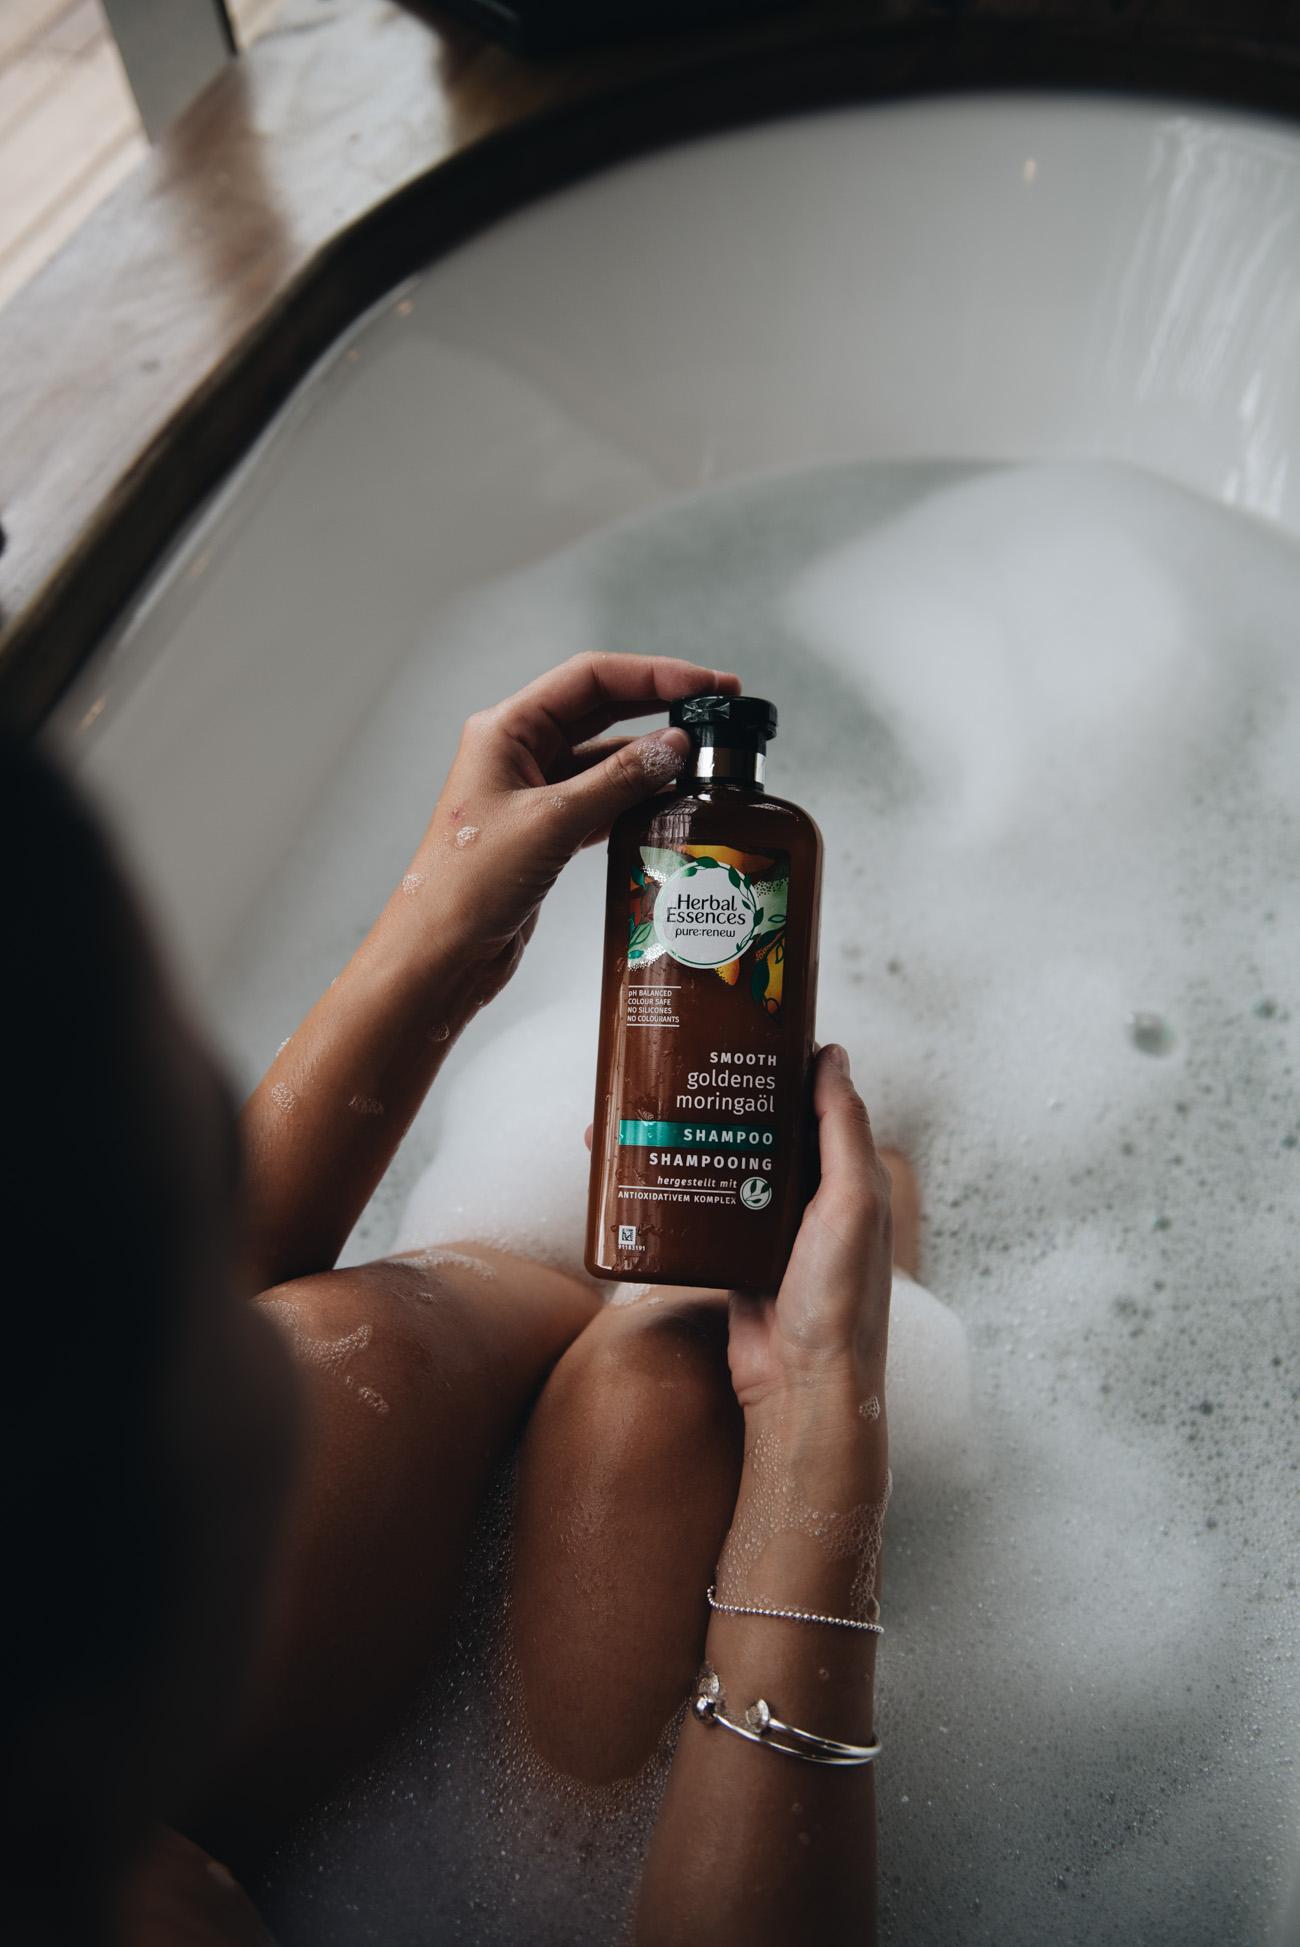 herbal-essences-shampoo-pure-renew-linie-GOLDENES-MORINGAÖL SHAMPOO-neu-2017-test-erfahrung-fashiioncarpet-nina-schwichtenberg